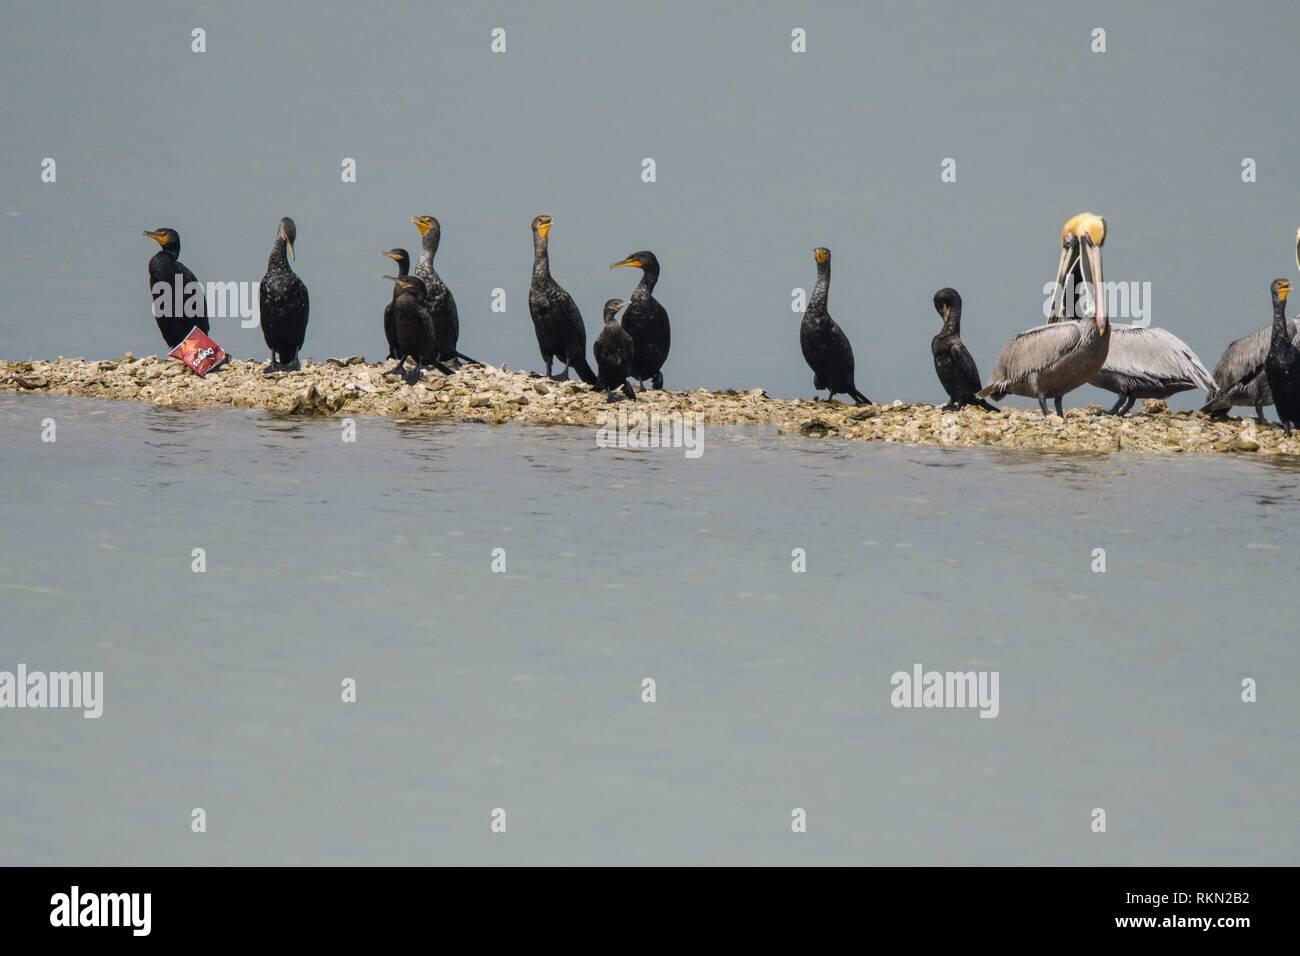 Neotropic/olivaceous cormorant (Phalacrocorax brasilianus), Aransas NWR, Texas, USA. - Stock Image